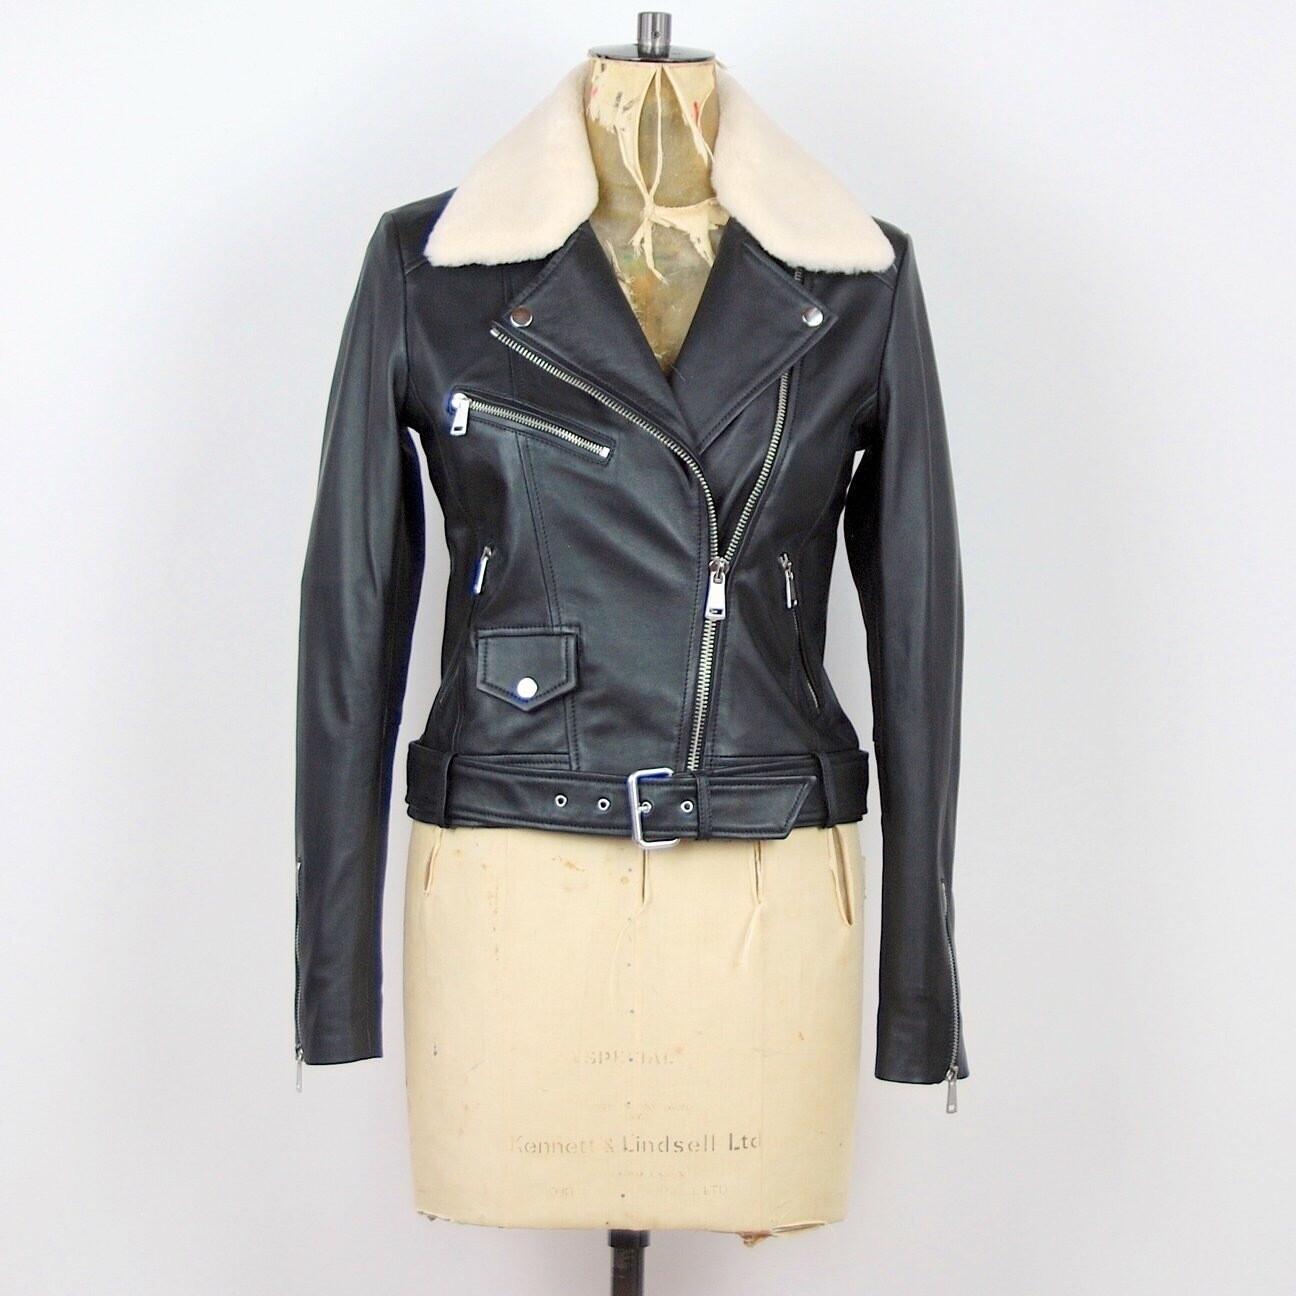 LAB Belted Biker Jacket With Faux Fur Collar - Black